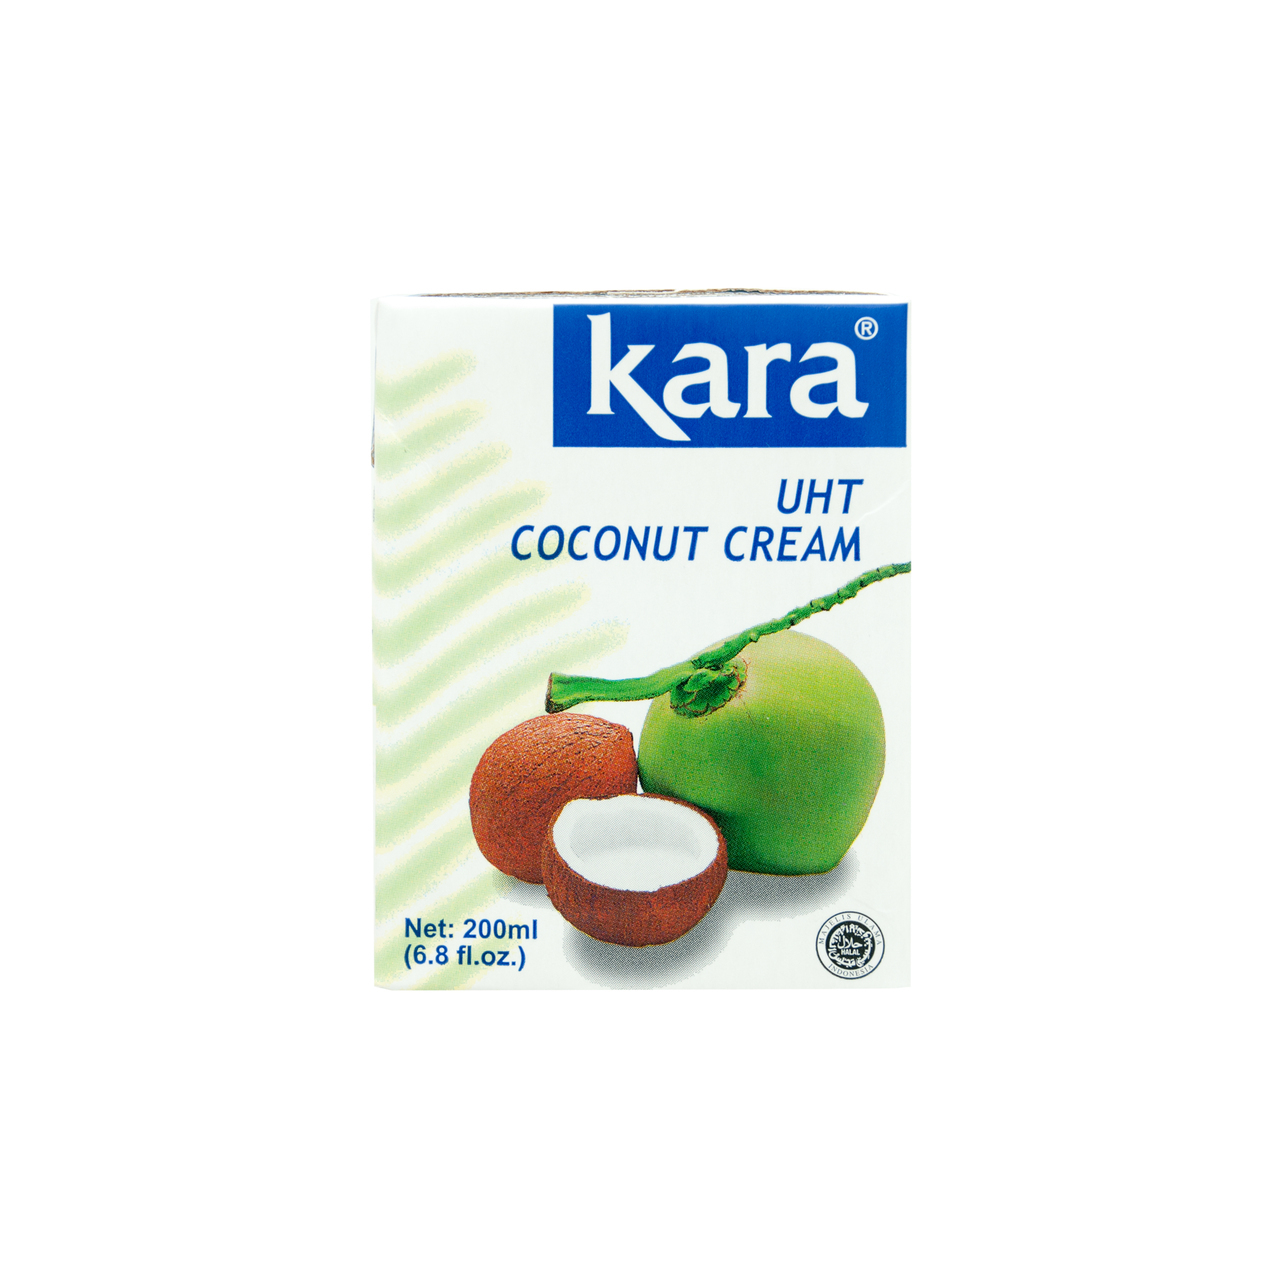 Kara Coconut Cream 200ml